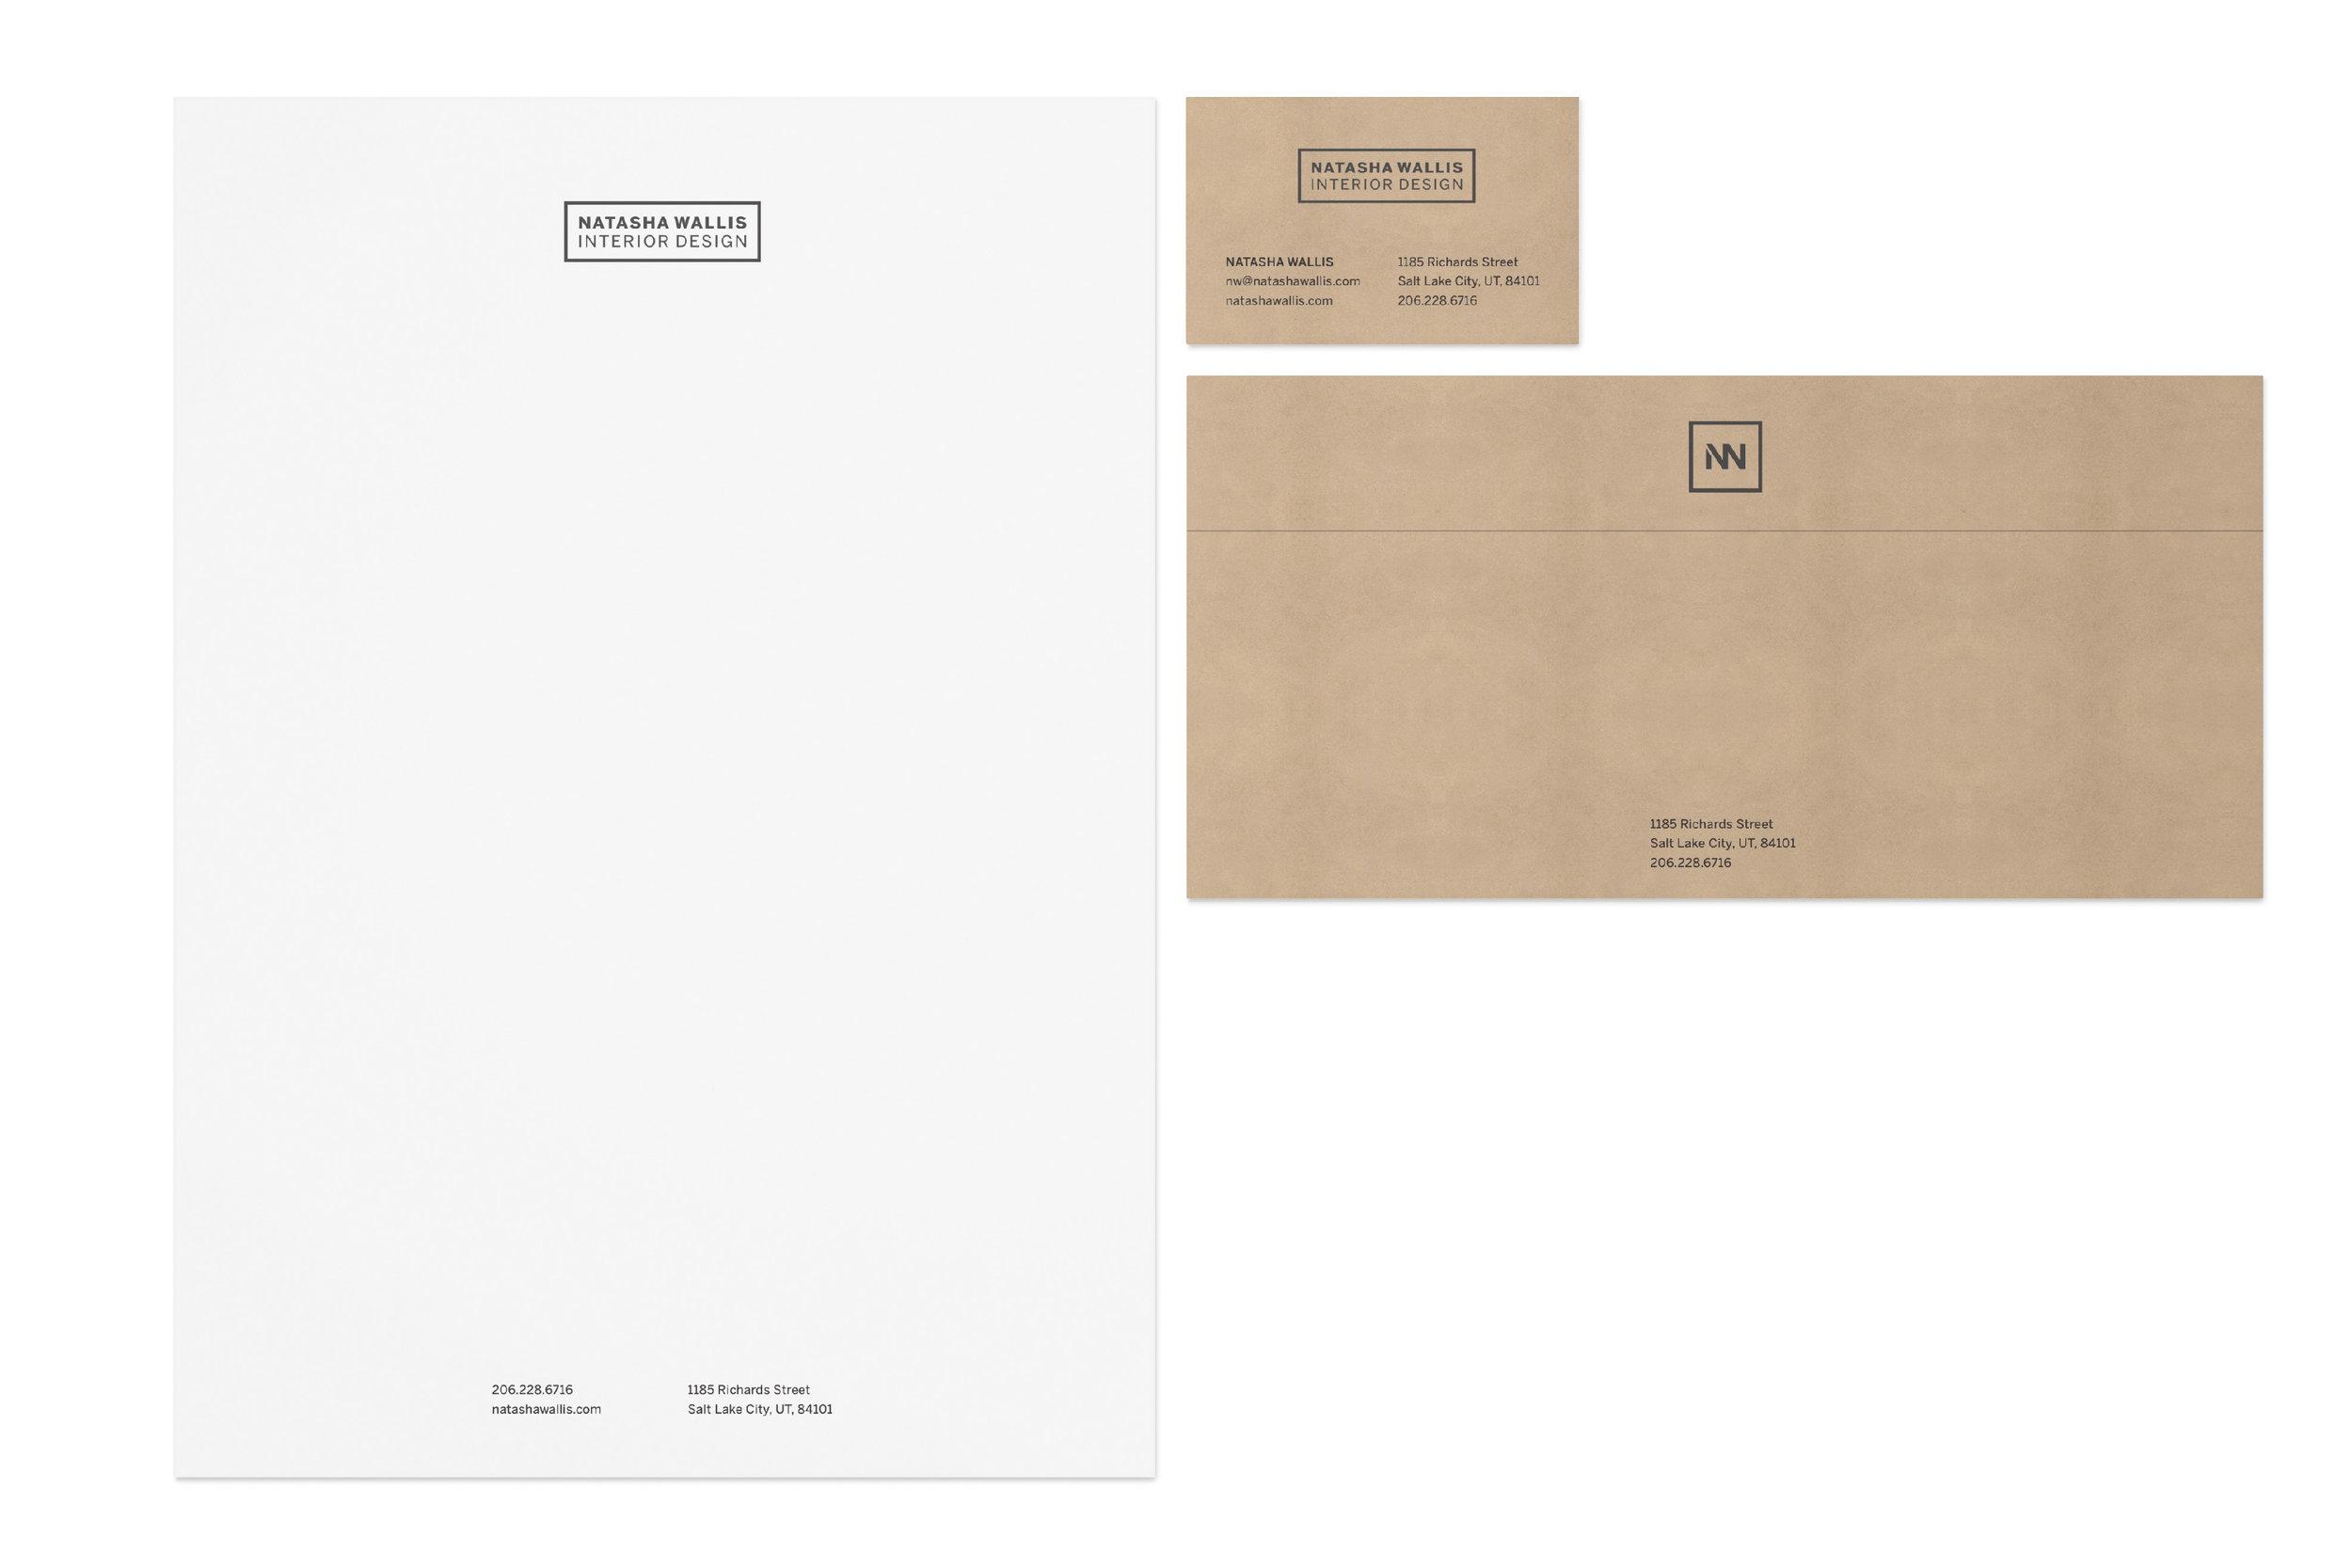 Stationery for Natasha Wallis Interior Design